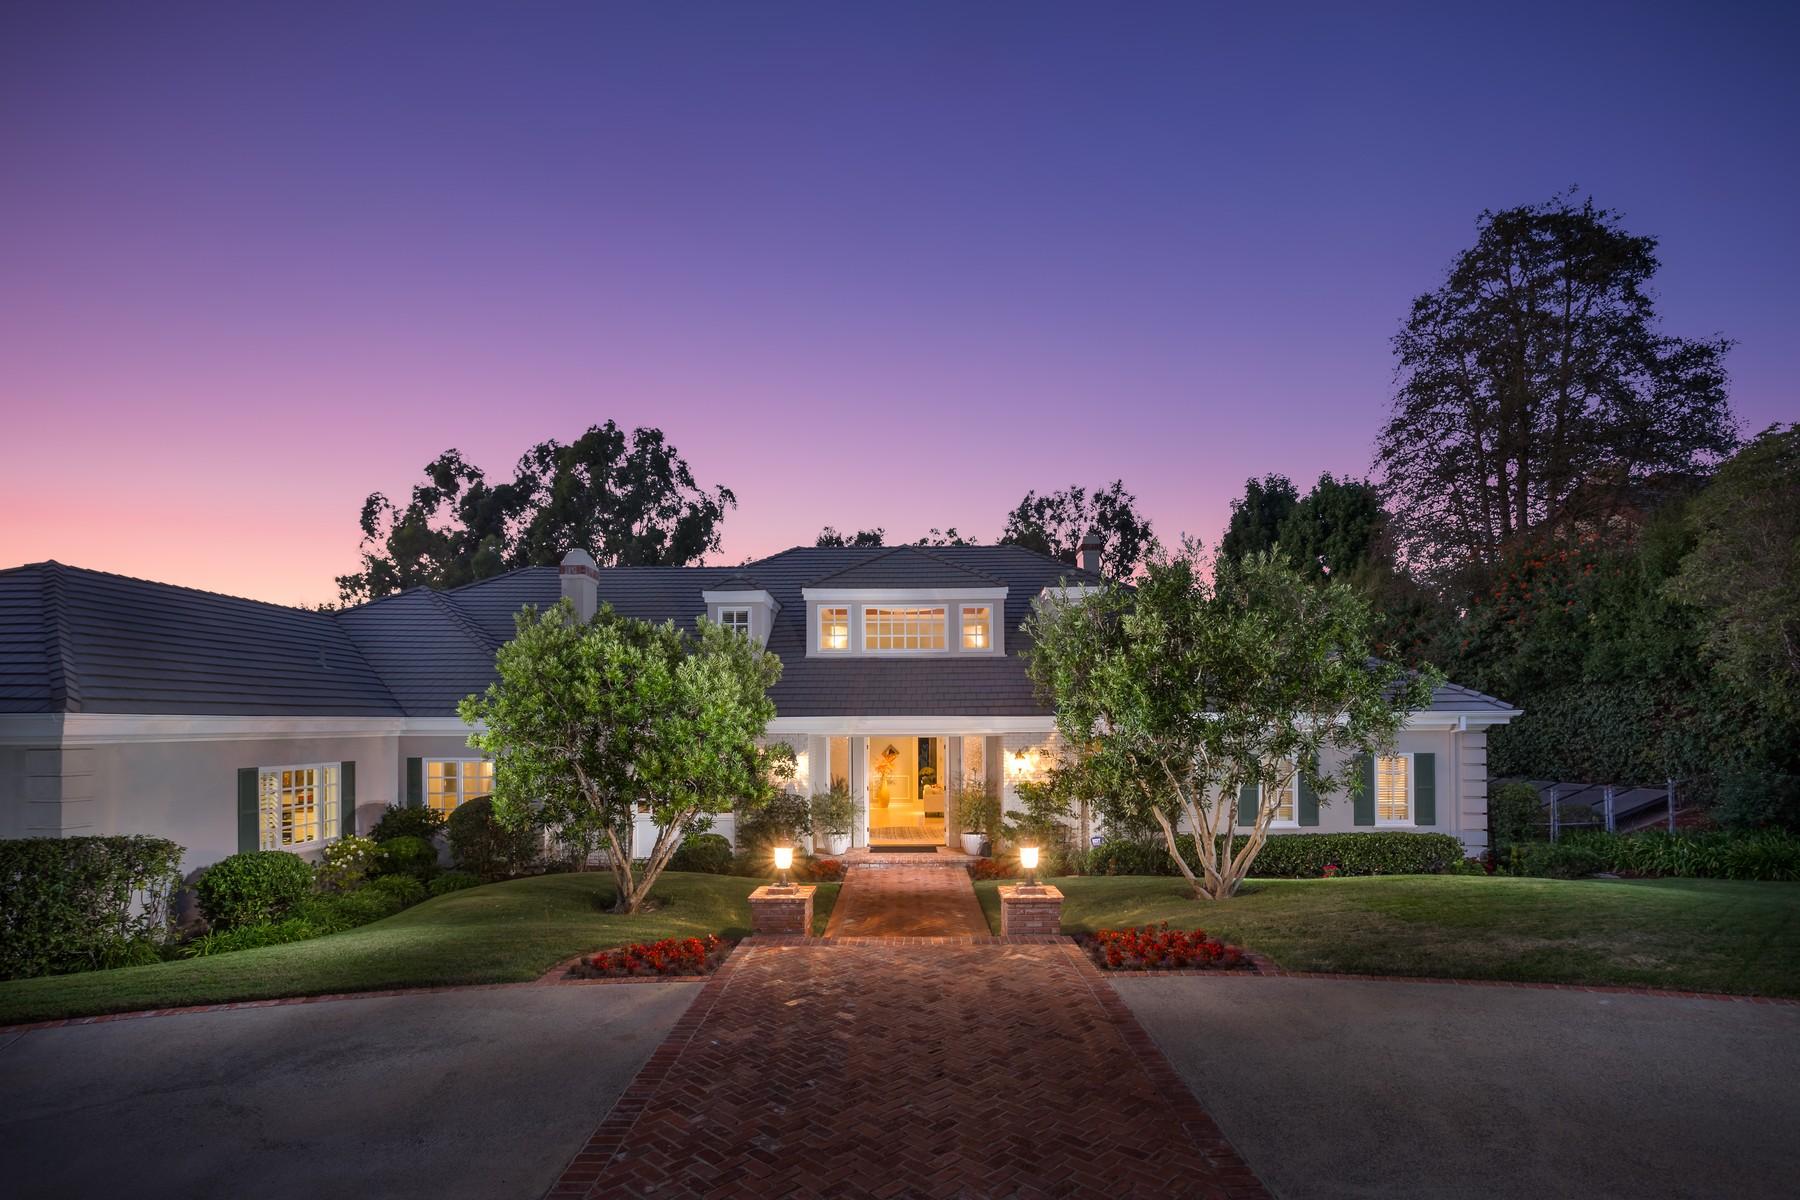 Property For Sale at 16750 Via De Los Rosales